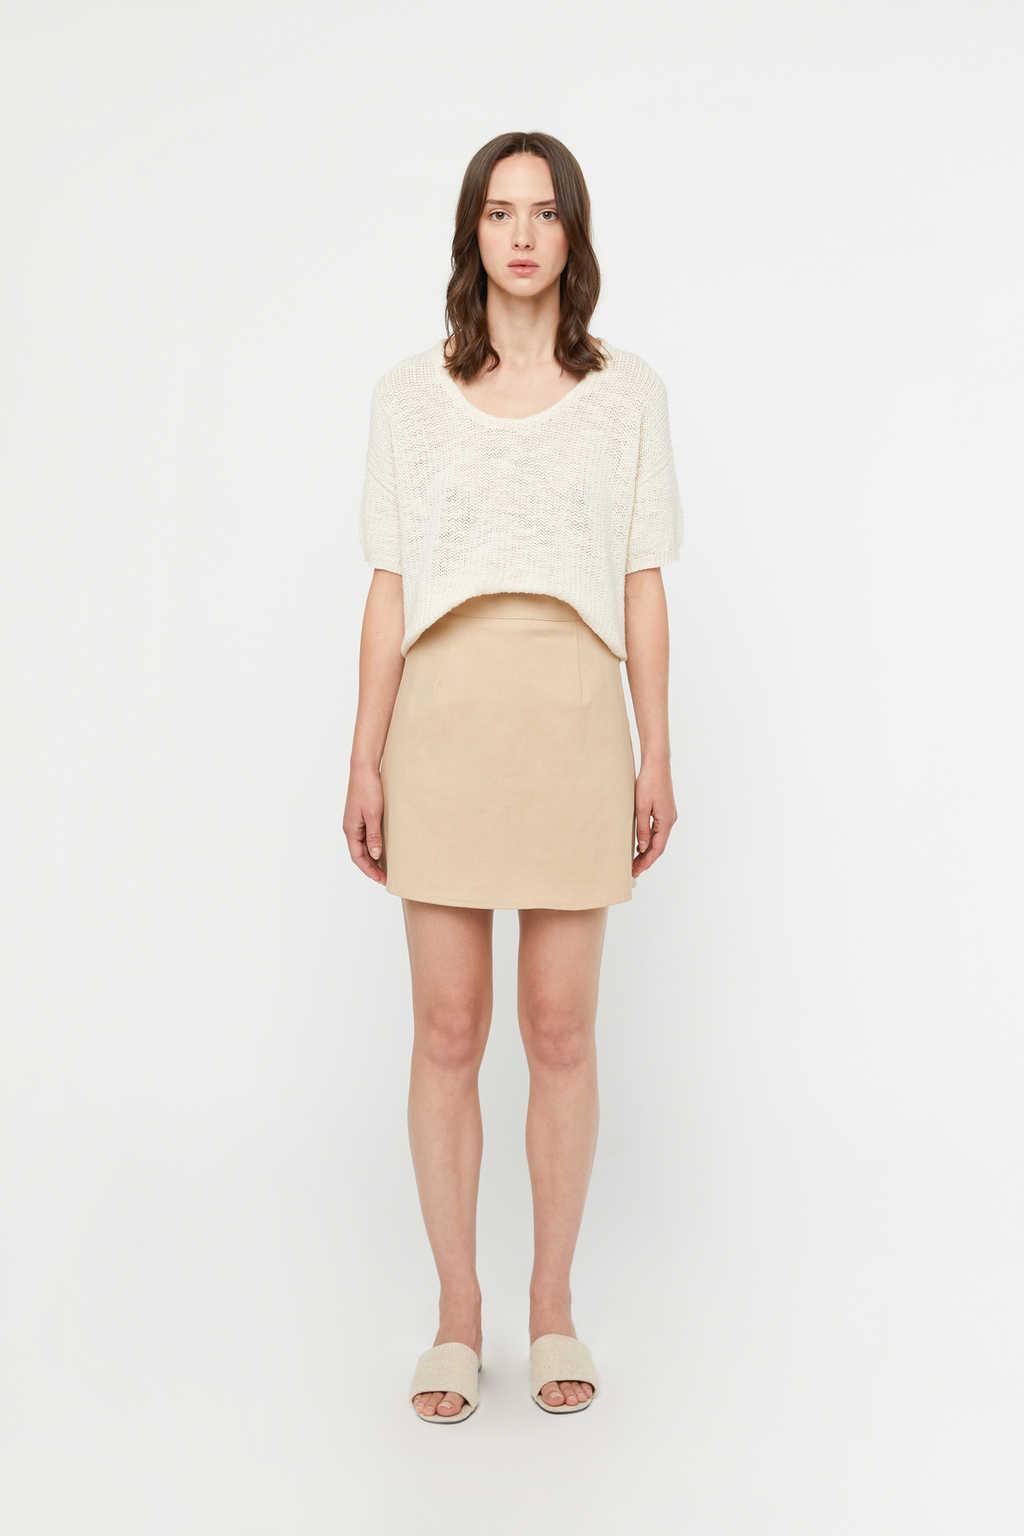 Sweater 3247 Cream 3